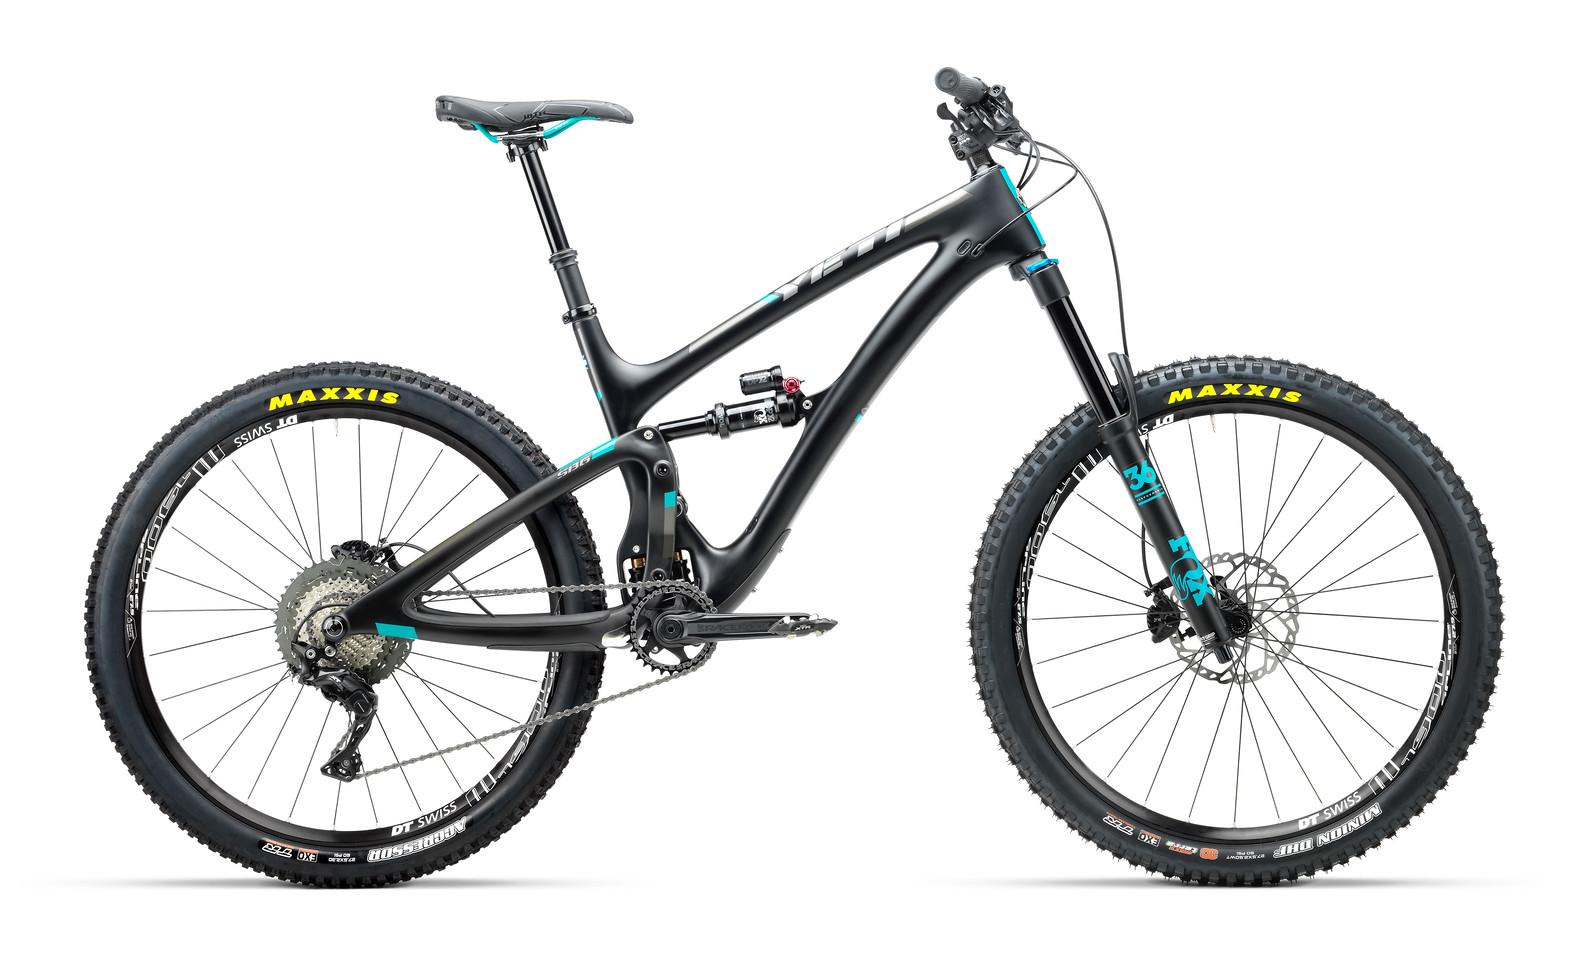 2018 Yeti SB6 Carbon XT/SLX Bike 2018_Yeti_SB6_Carbon_XT-SLX_black